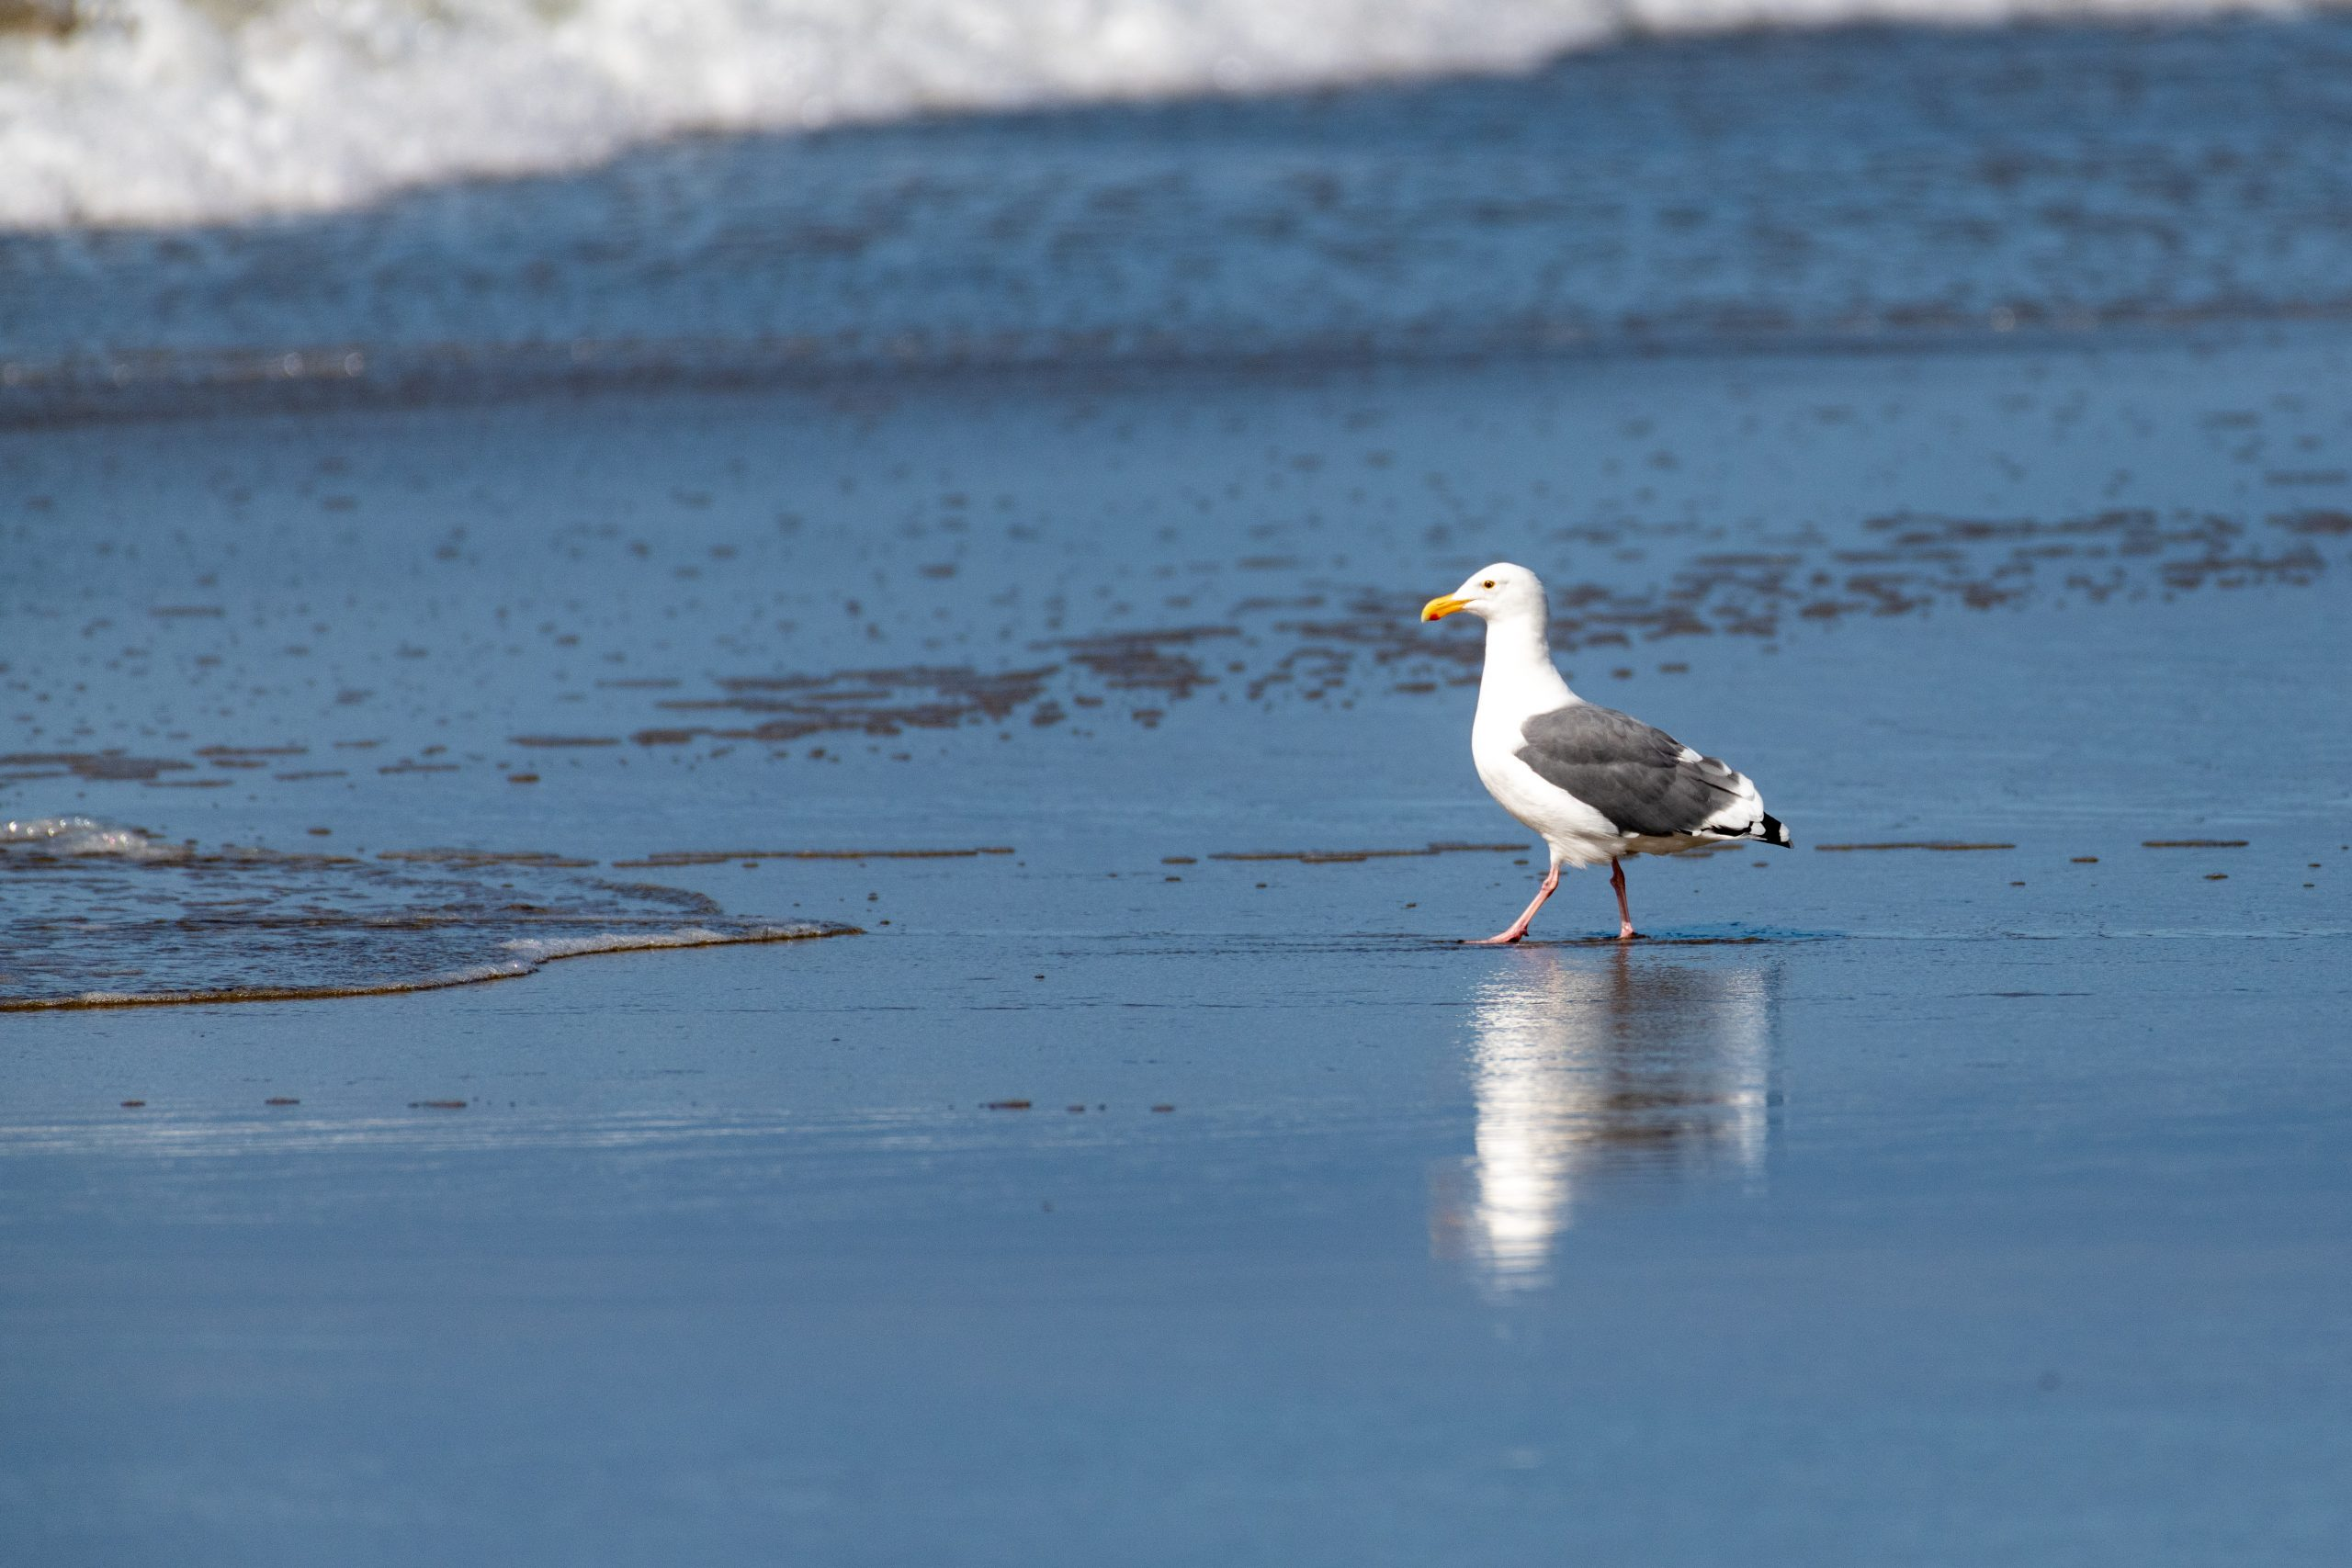 Florence, Oregon - Seagull on Beach